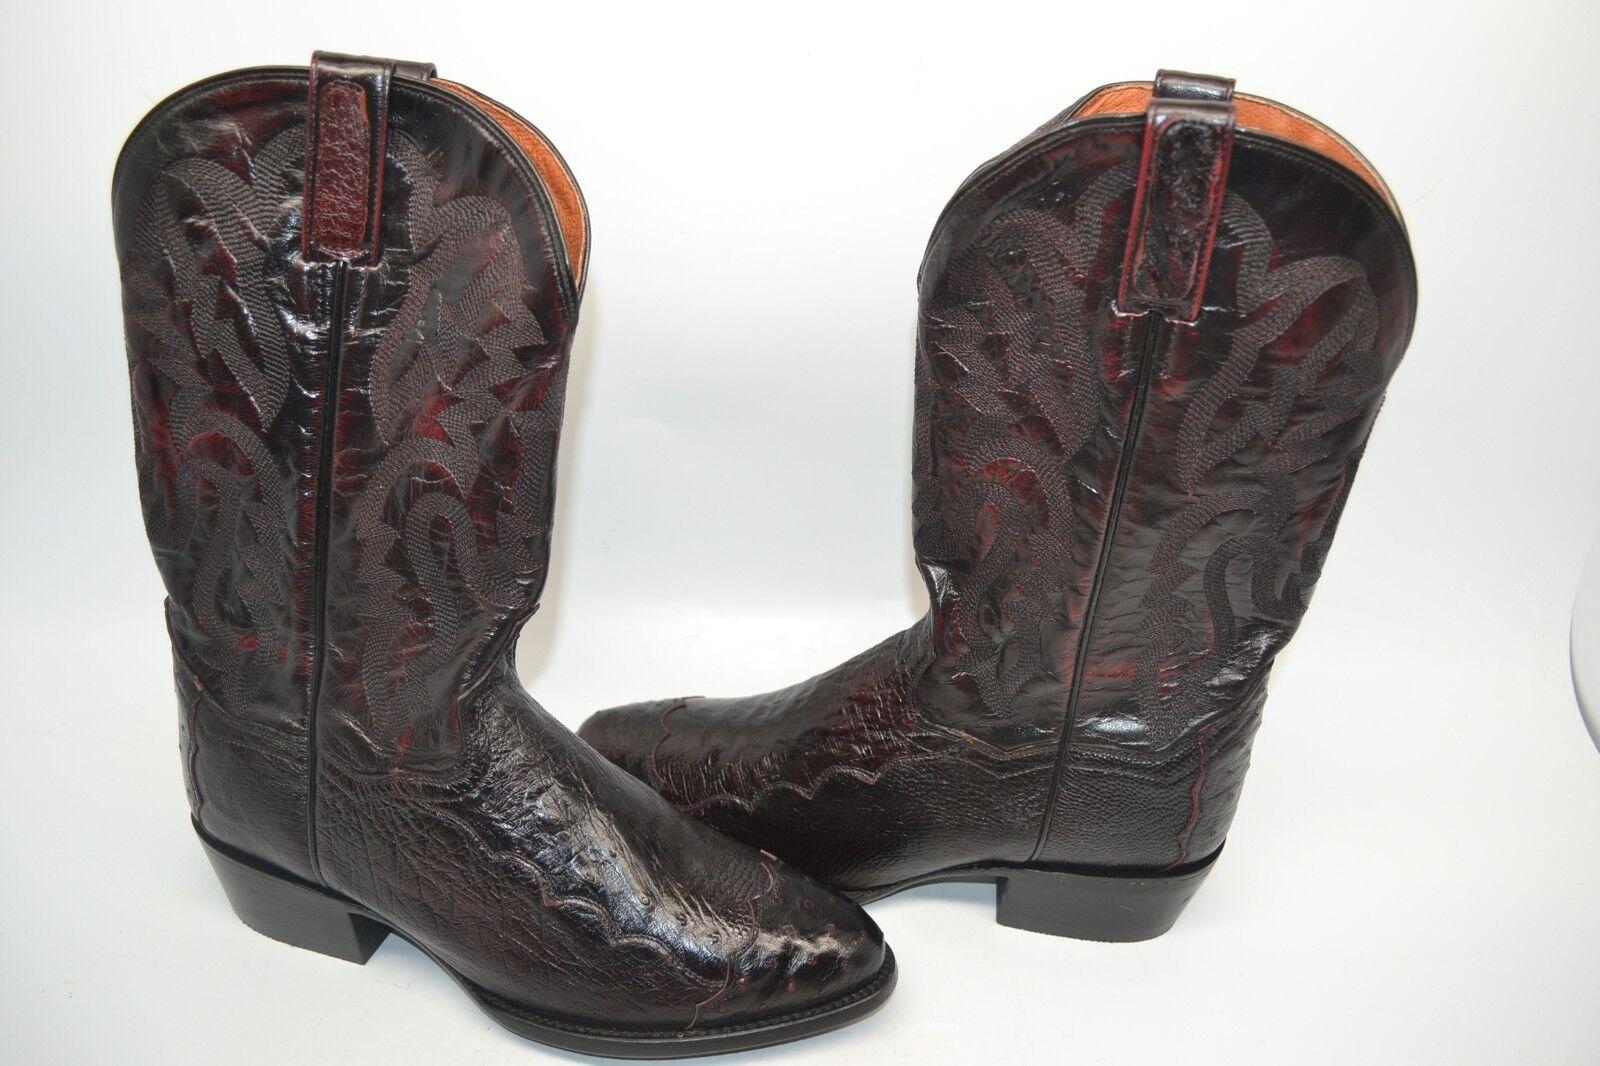 DAN POST POST POST PUGH WESTERN schwarz OSTRICH TIP ROUND TOE 9 D COWBOY EXOTIC Stiefel DPP5205 dbc28e